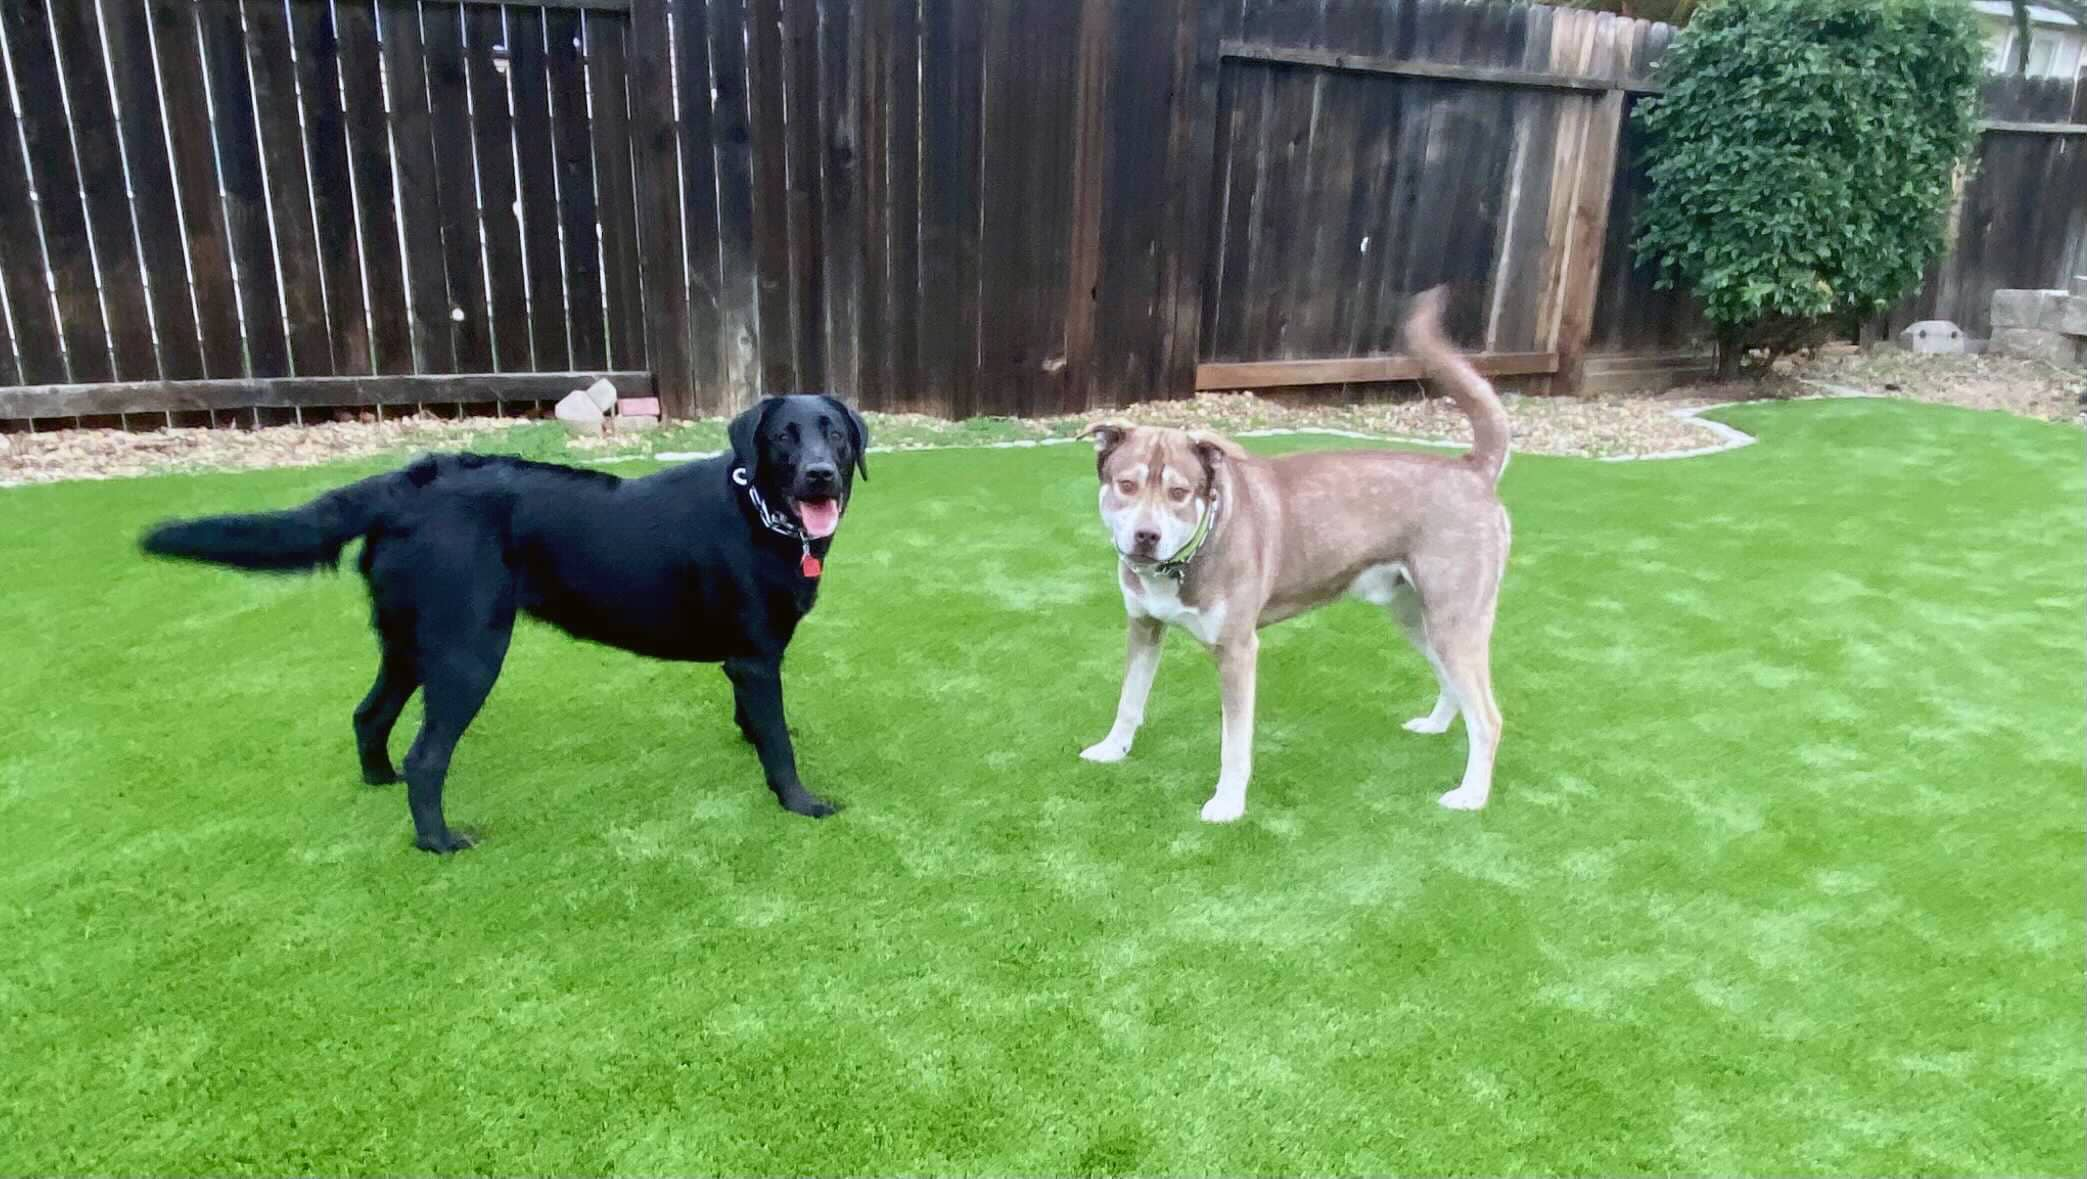 backyard pet friendly dog with artificial turf